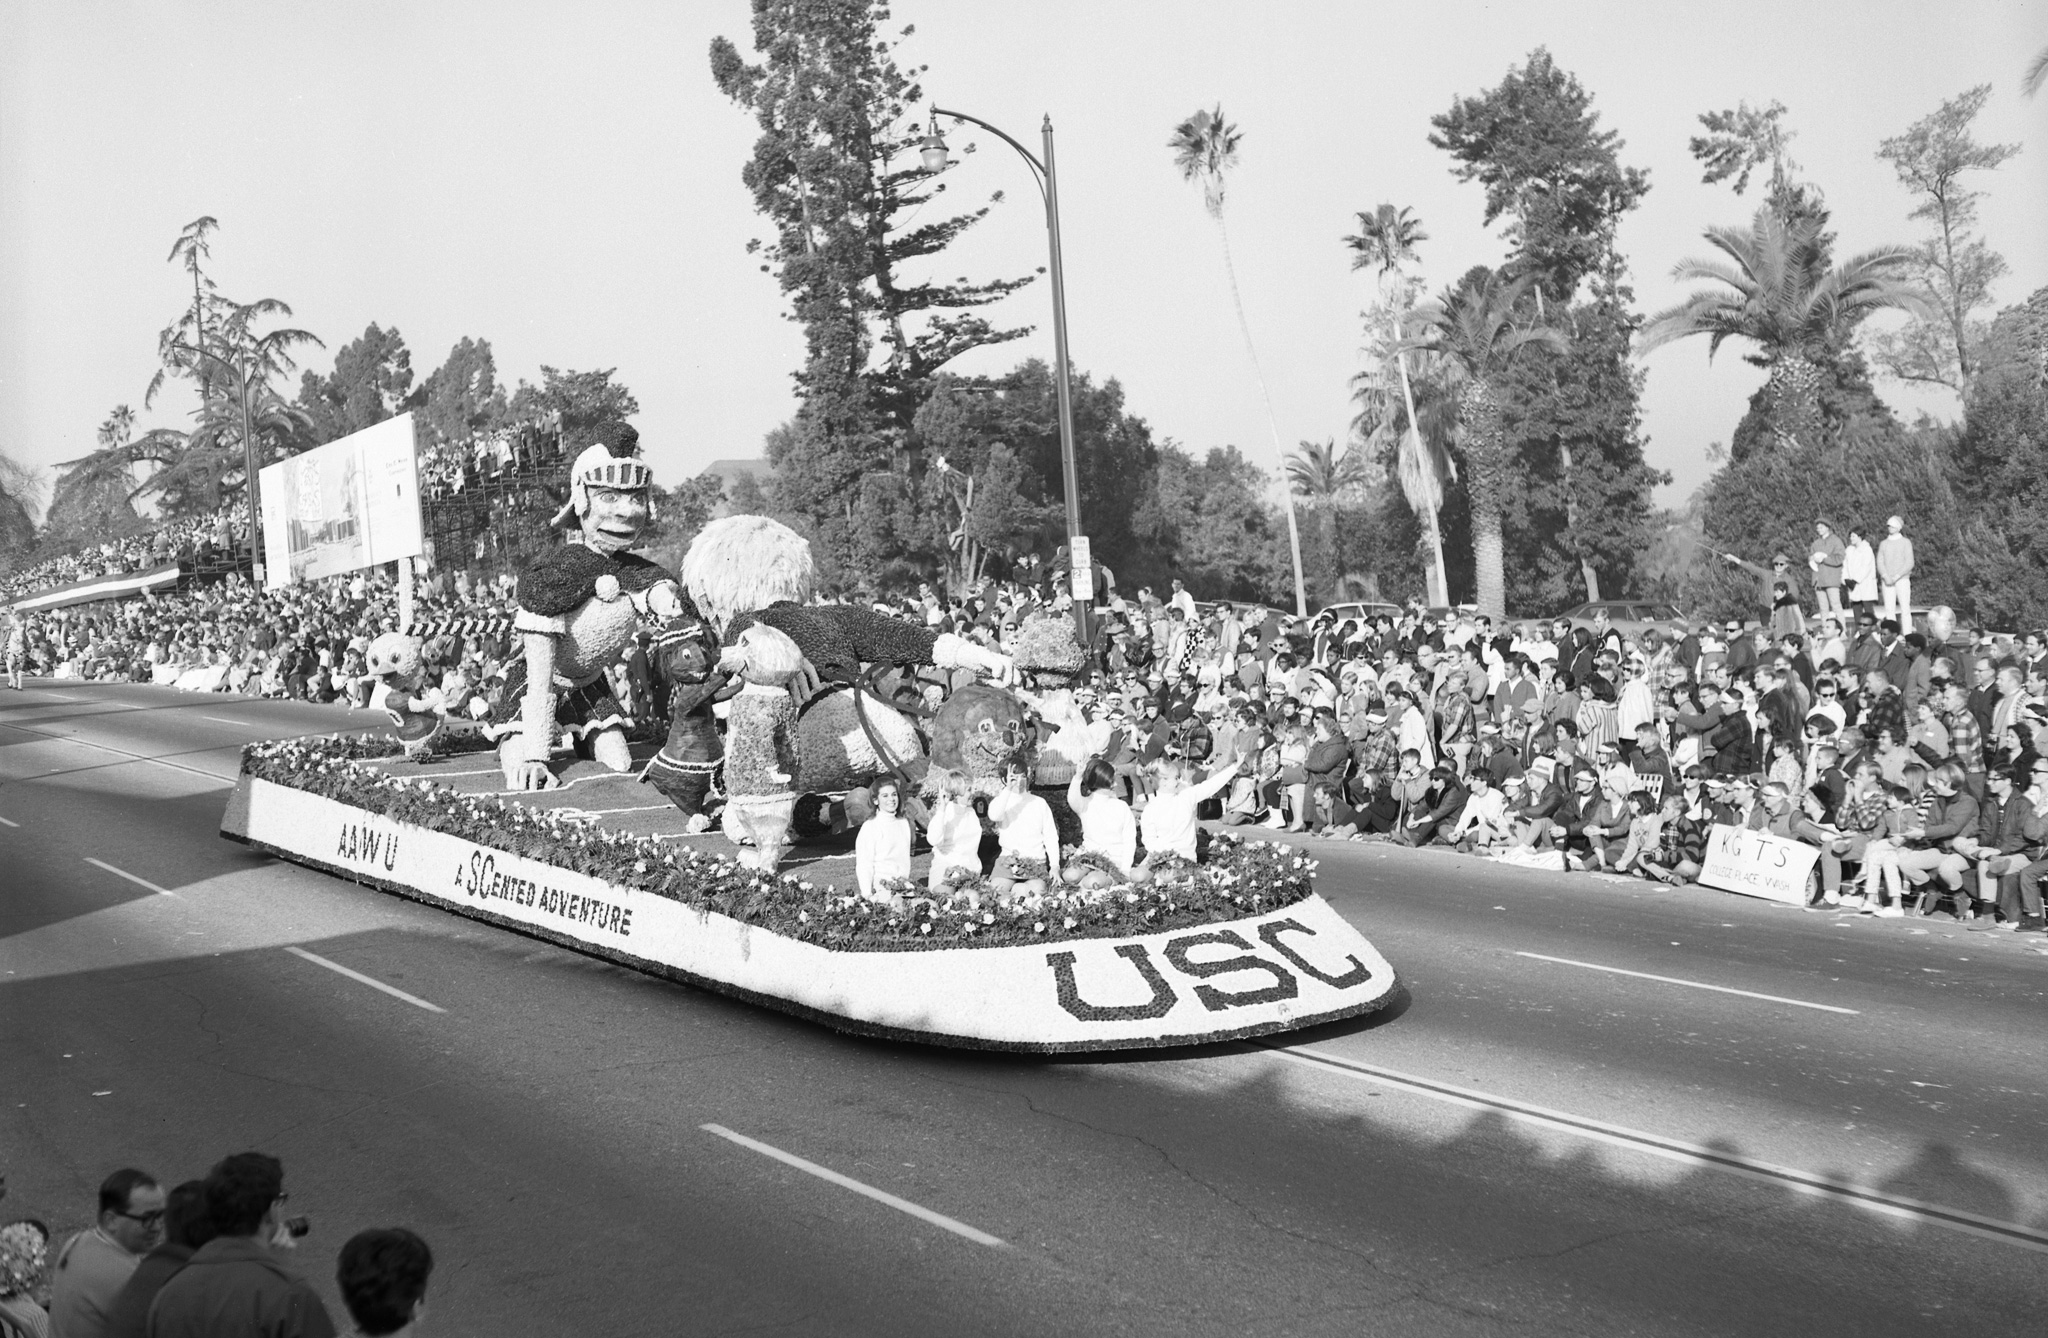 1968 Rose Parade